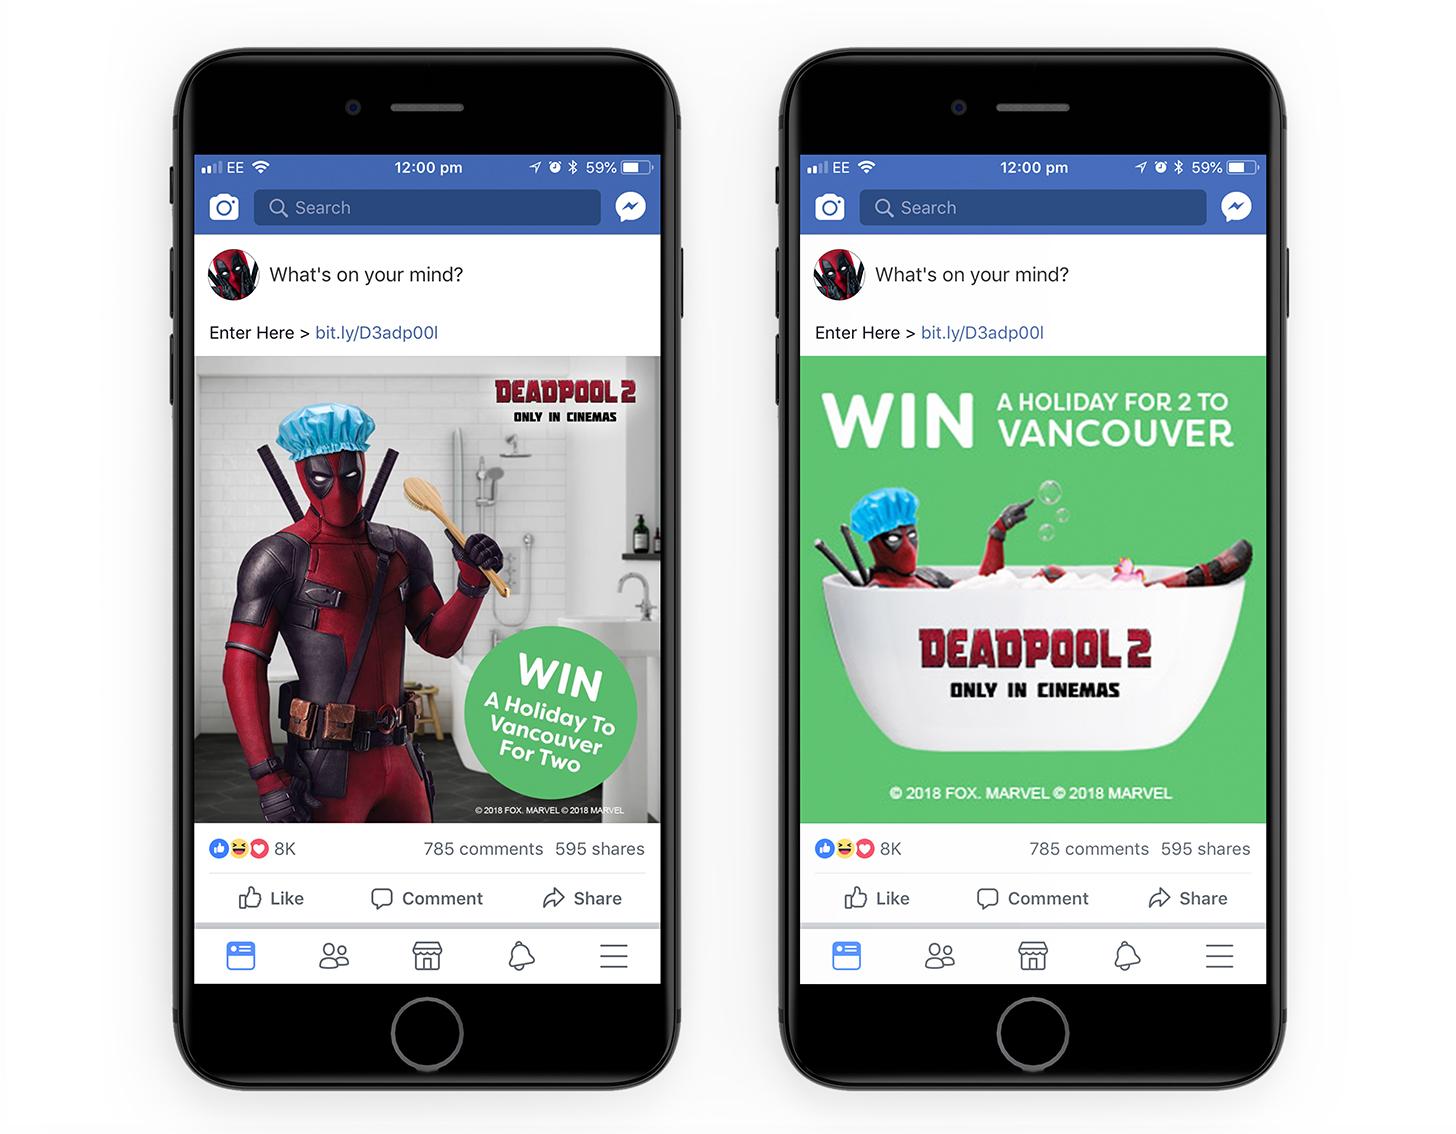 Deadpool 2 Film Partnership Victorian Plumbing Social Facebook Promotion